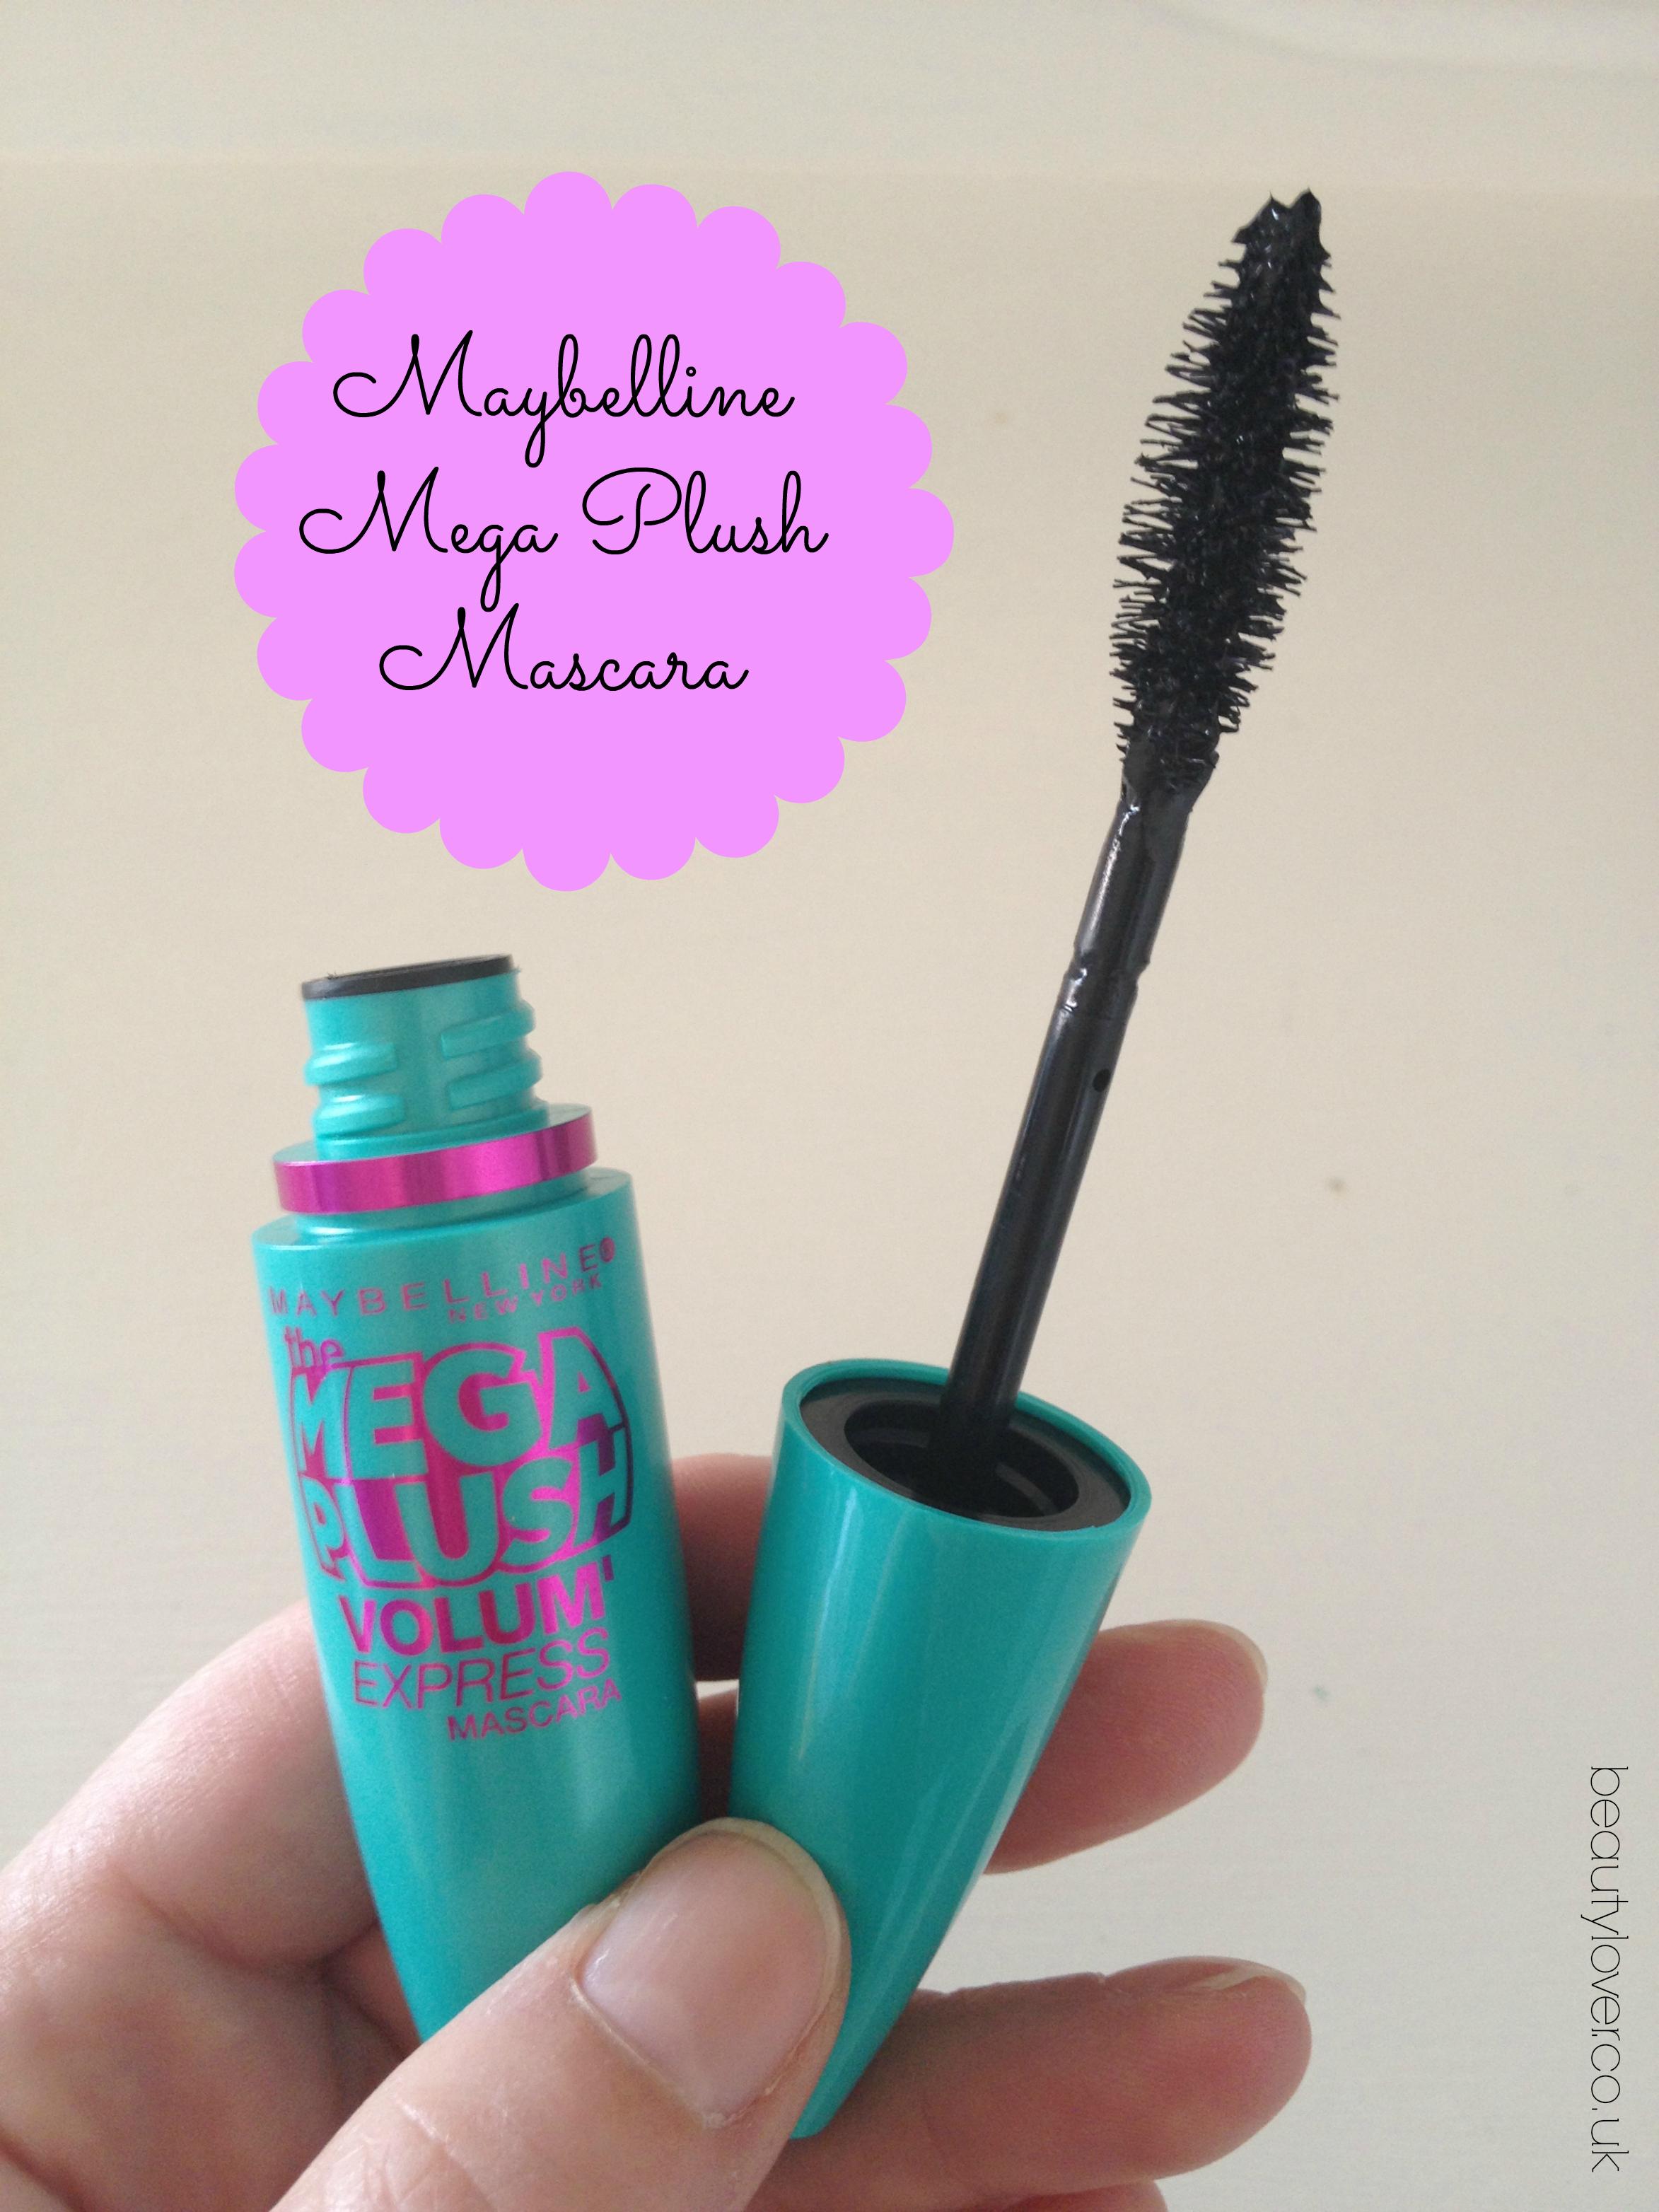 Mascara maybelline tumblr